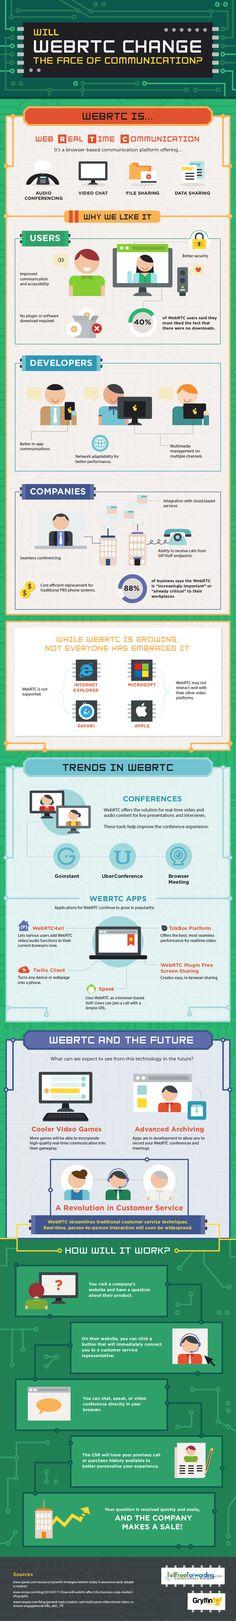 Will WebRTC Change the Face of Communication? #infographic #WebRTC #CustomerService #Website #infografía